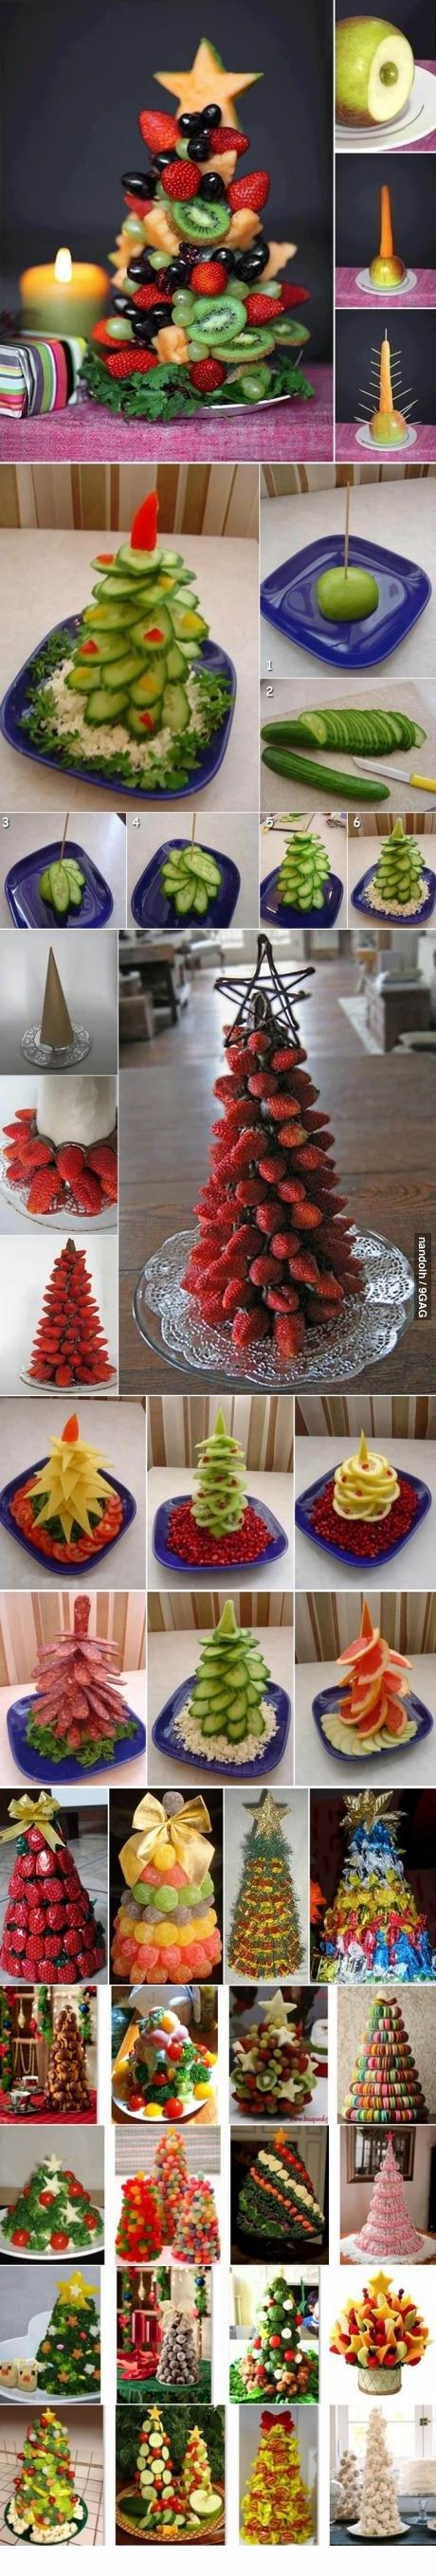 Christmas Tree food